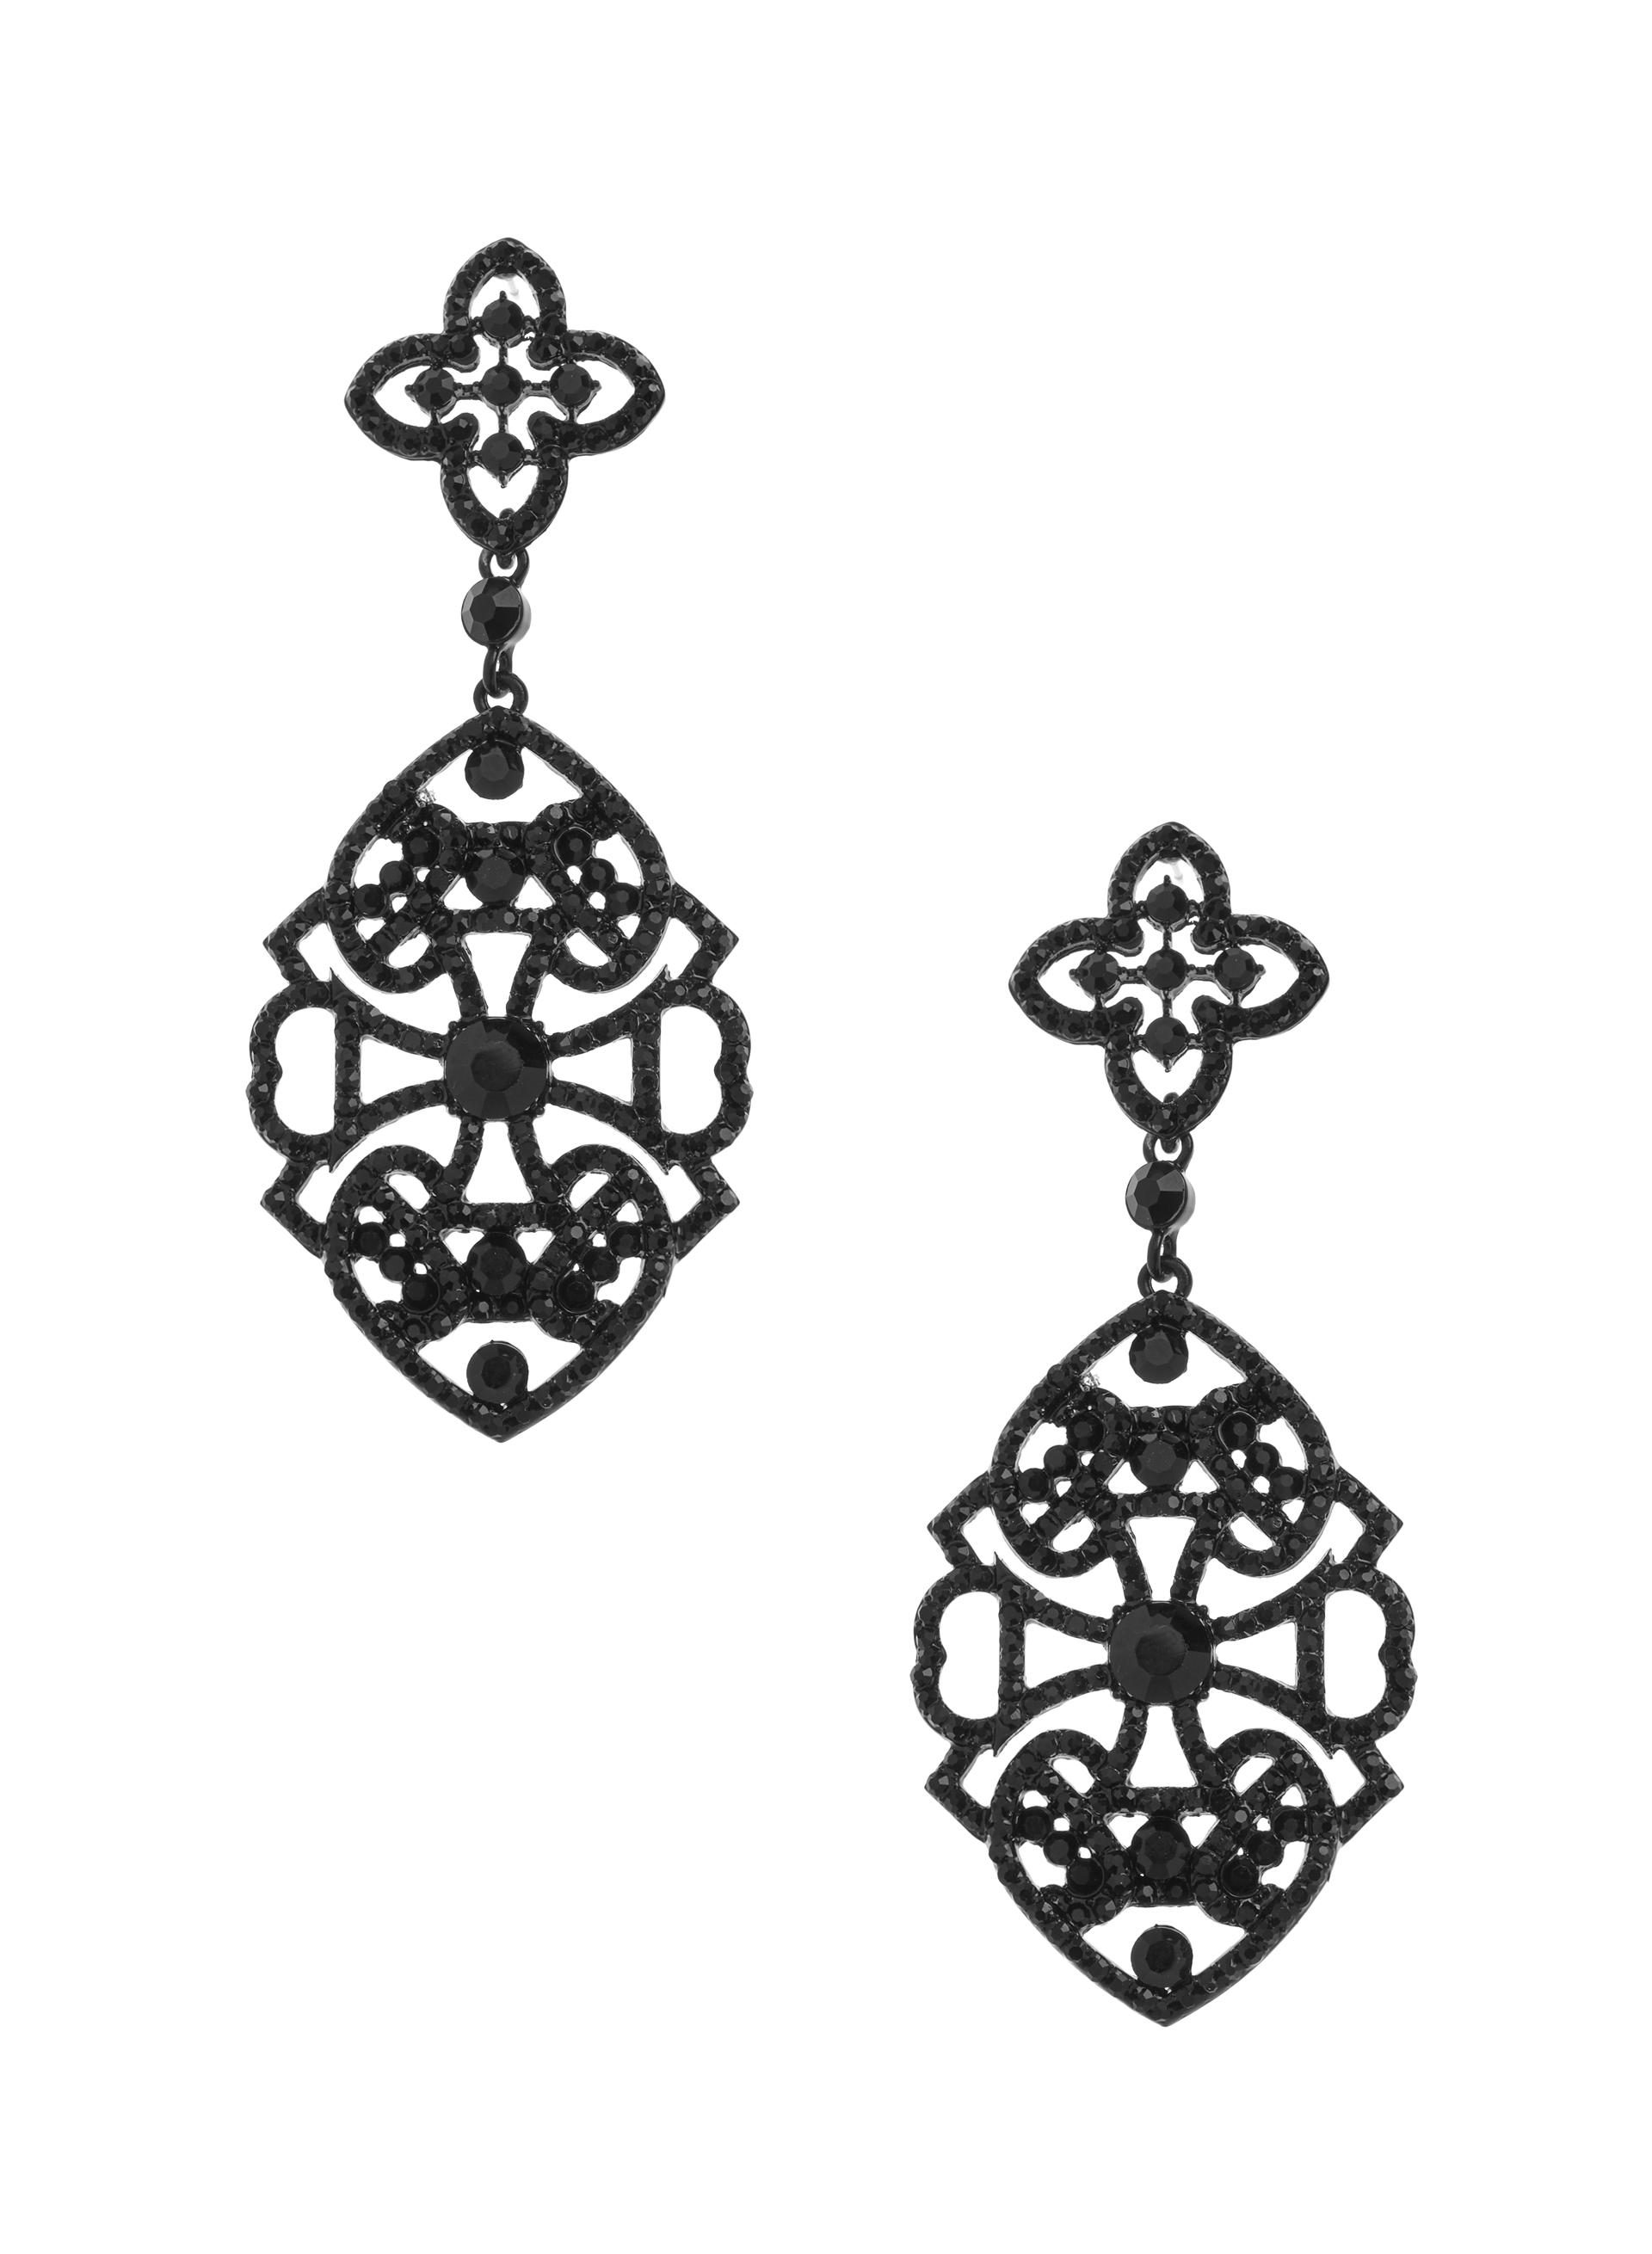 Filigree Chandelier Earrings | Melanie Lyne